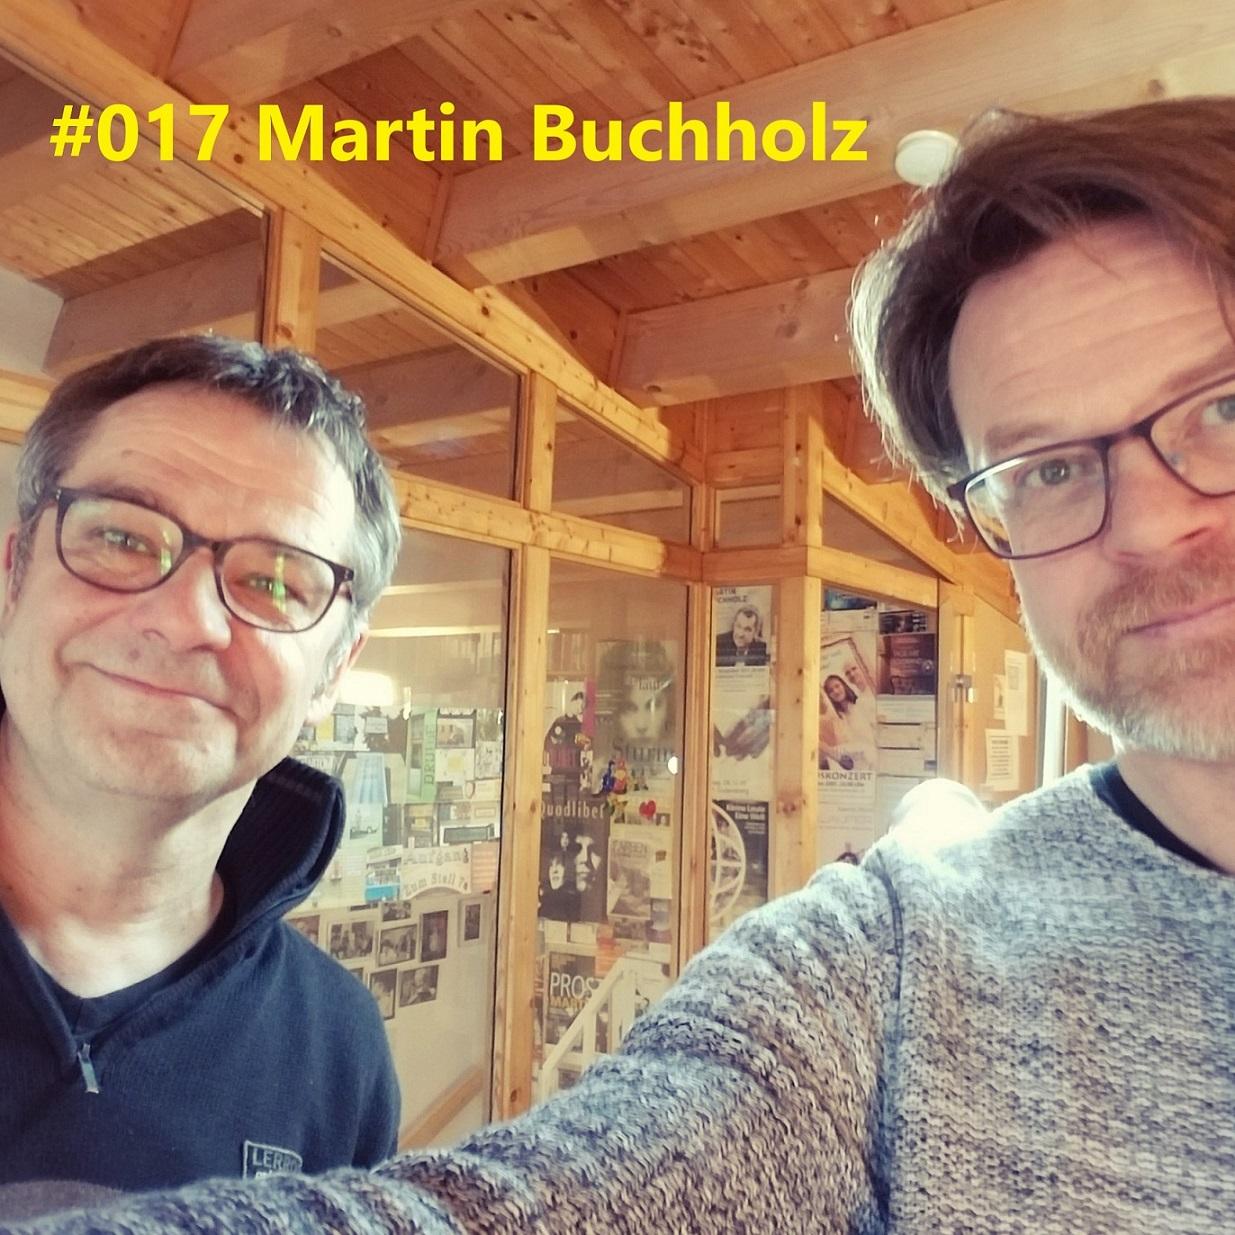 Martin Buchholz